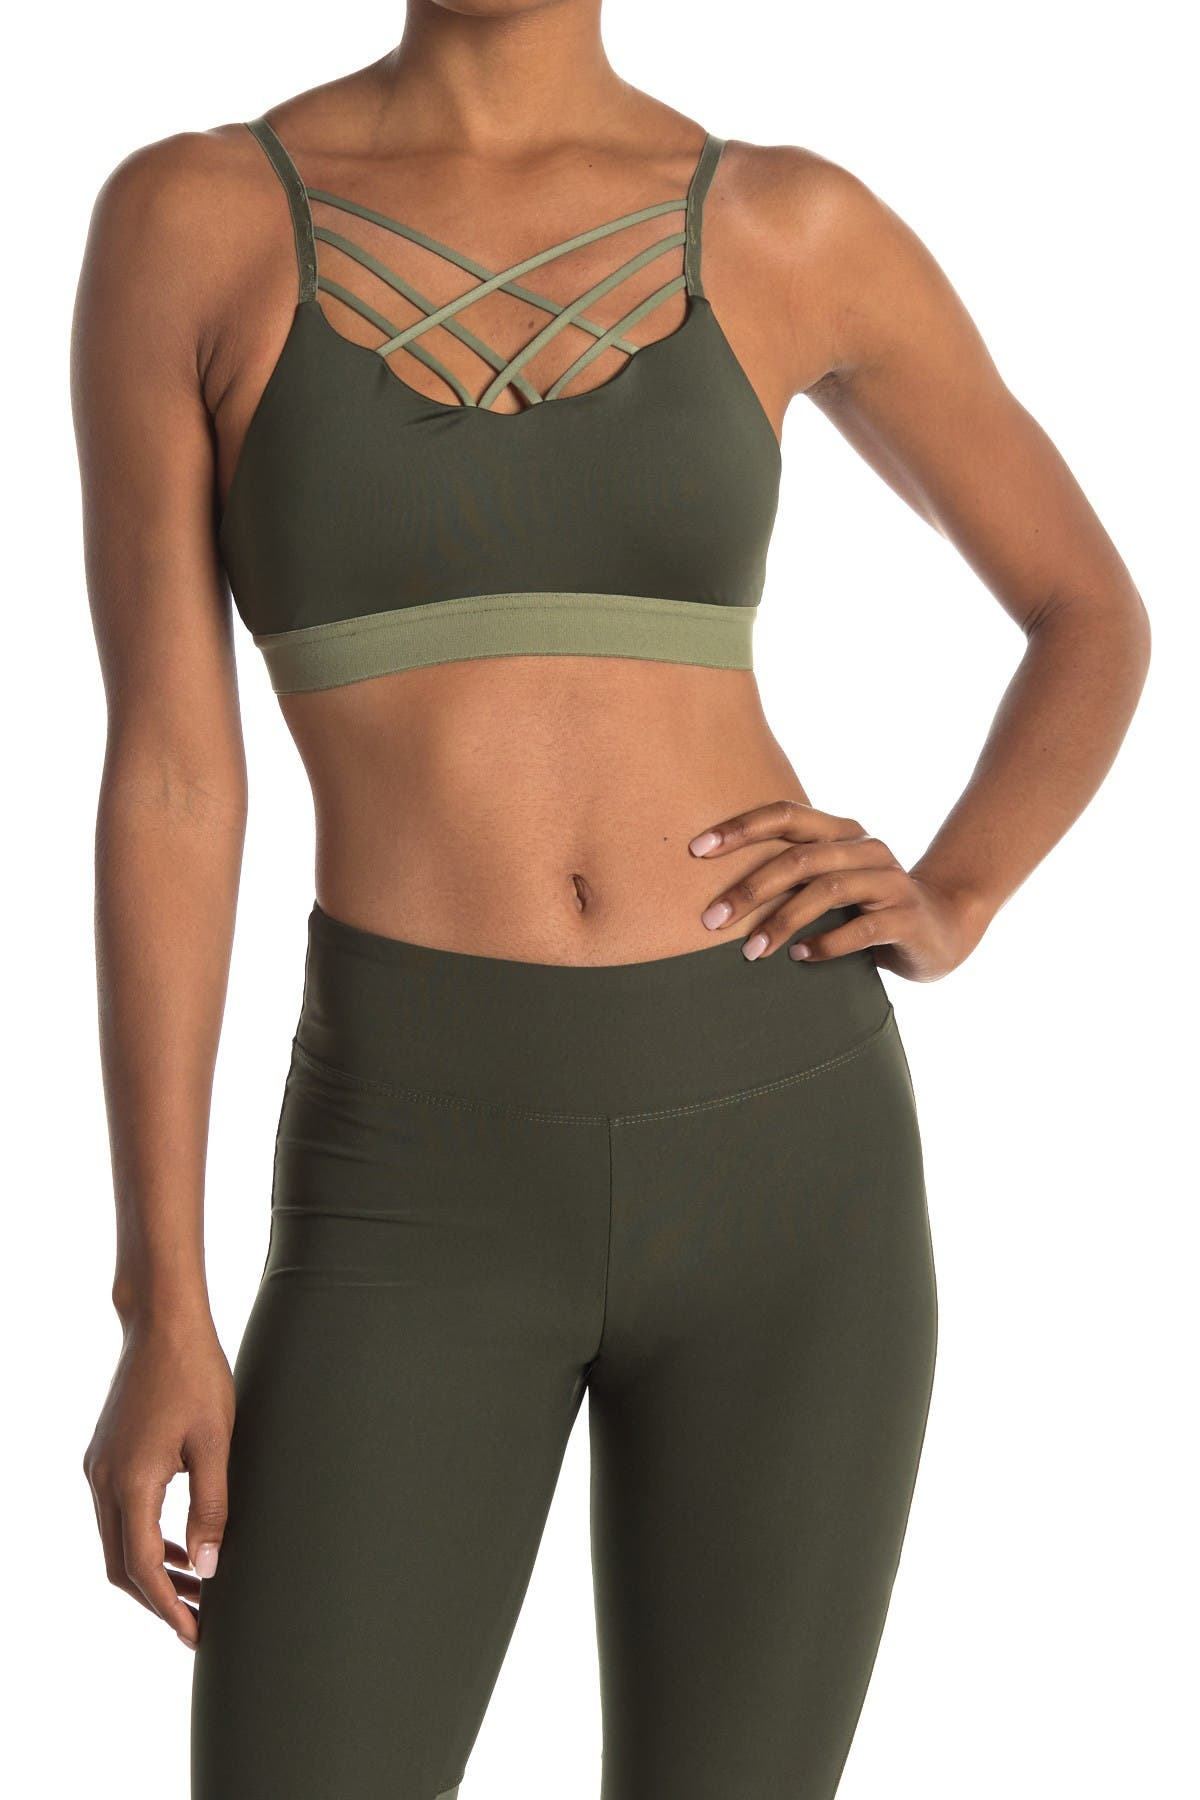 Image of The Balance Collection Peyton Sports Bra